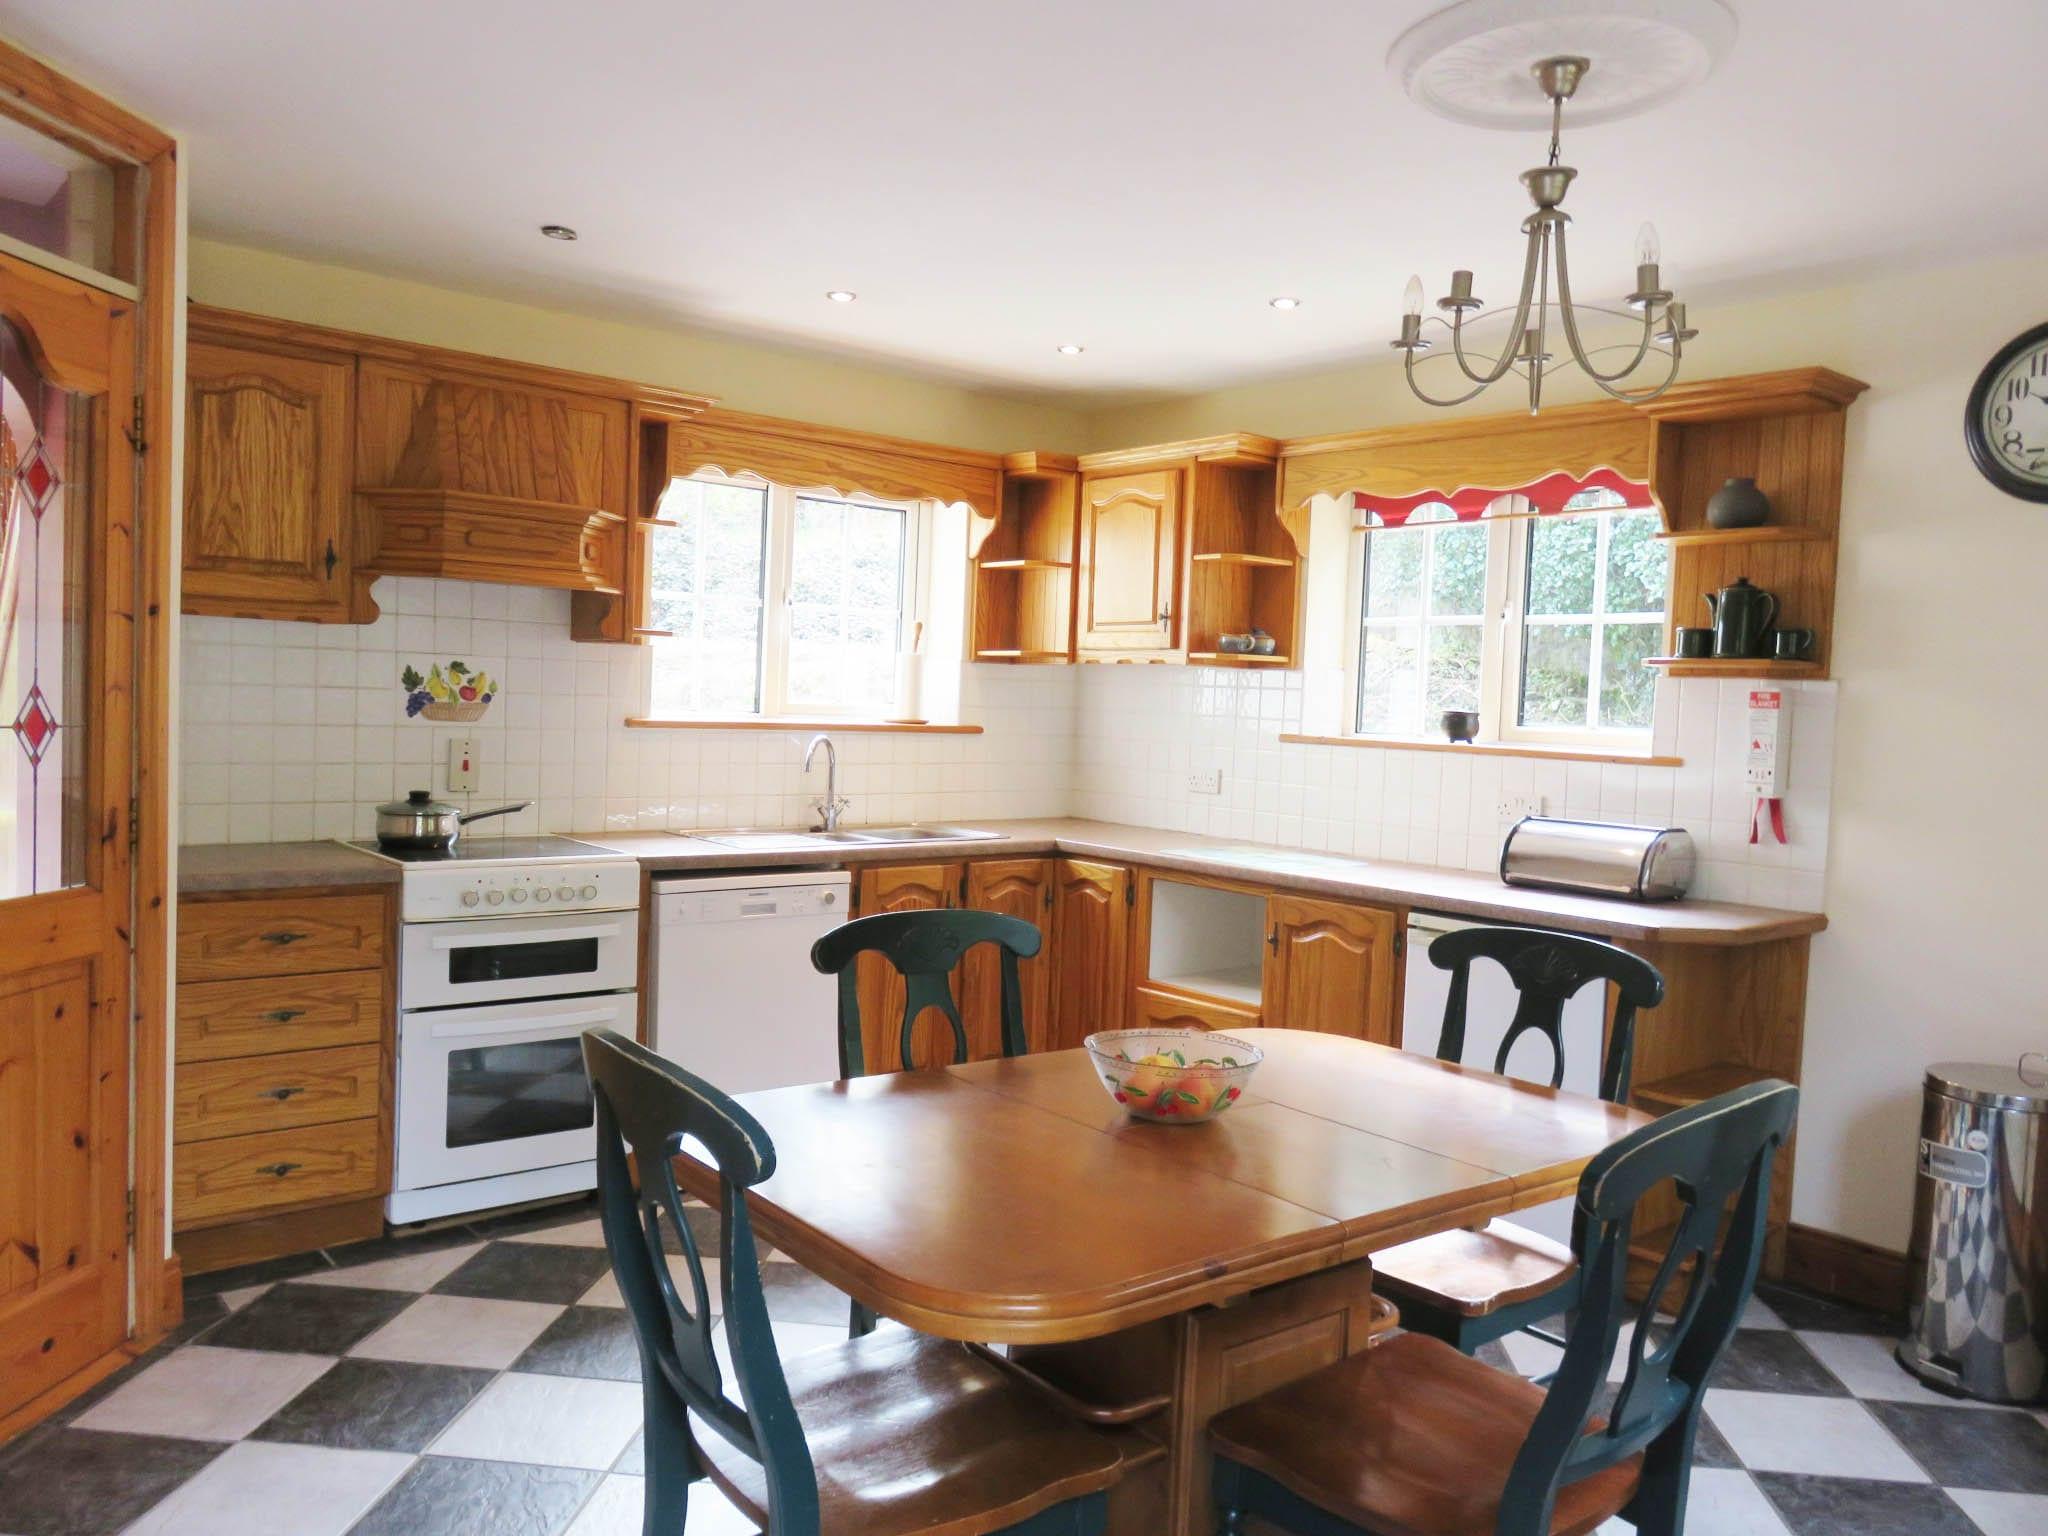 6. Kitchen IMG_5872 lightened